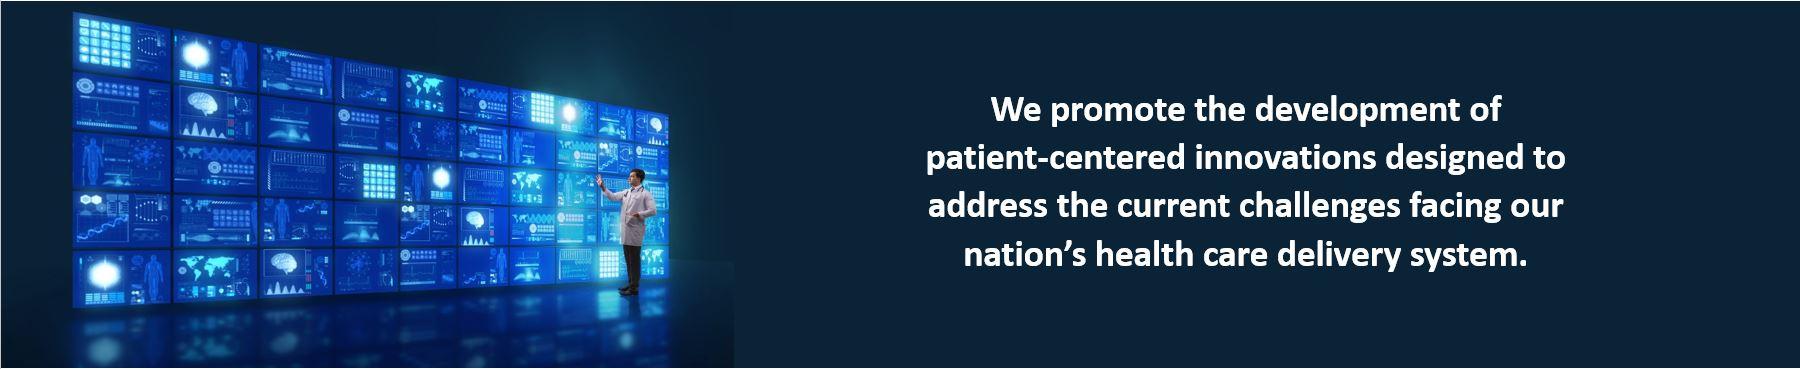 Center for Health Innovation - Homepage Banner